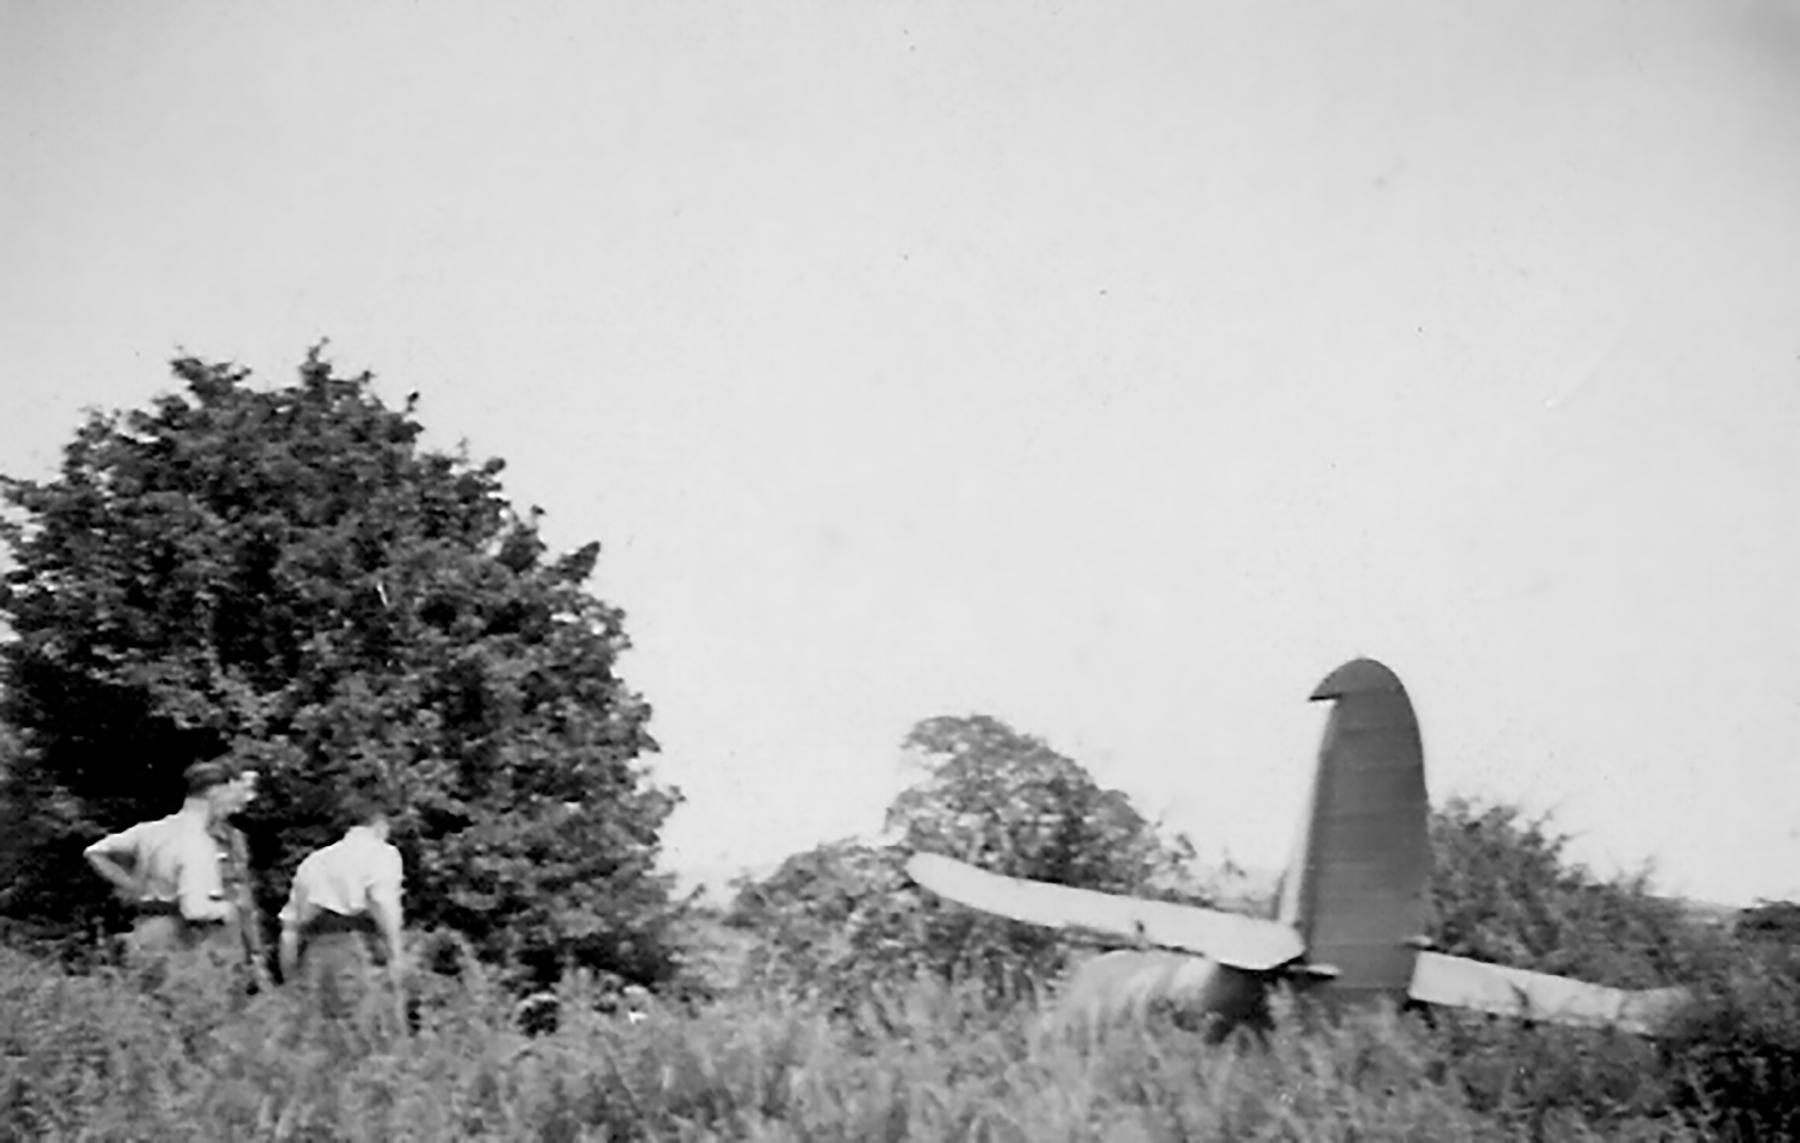 Spitfire MkVb RAF 92Sqn QJB Clive Wawn Lancastrian W3410 Beachy Head 04